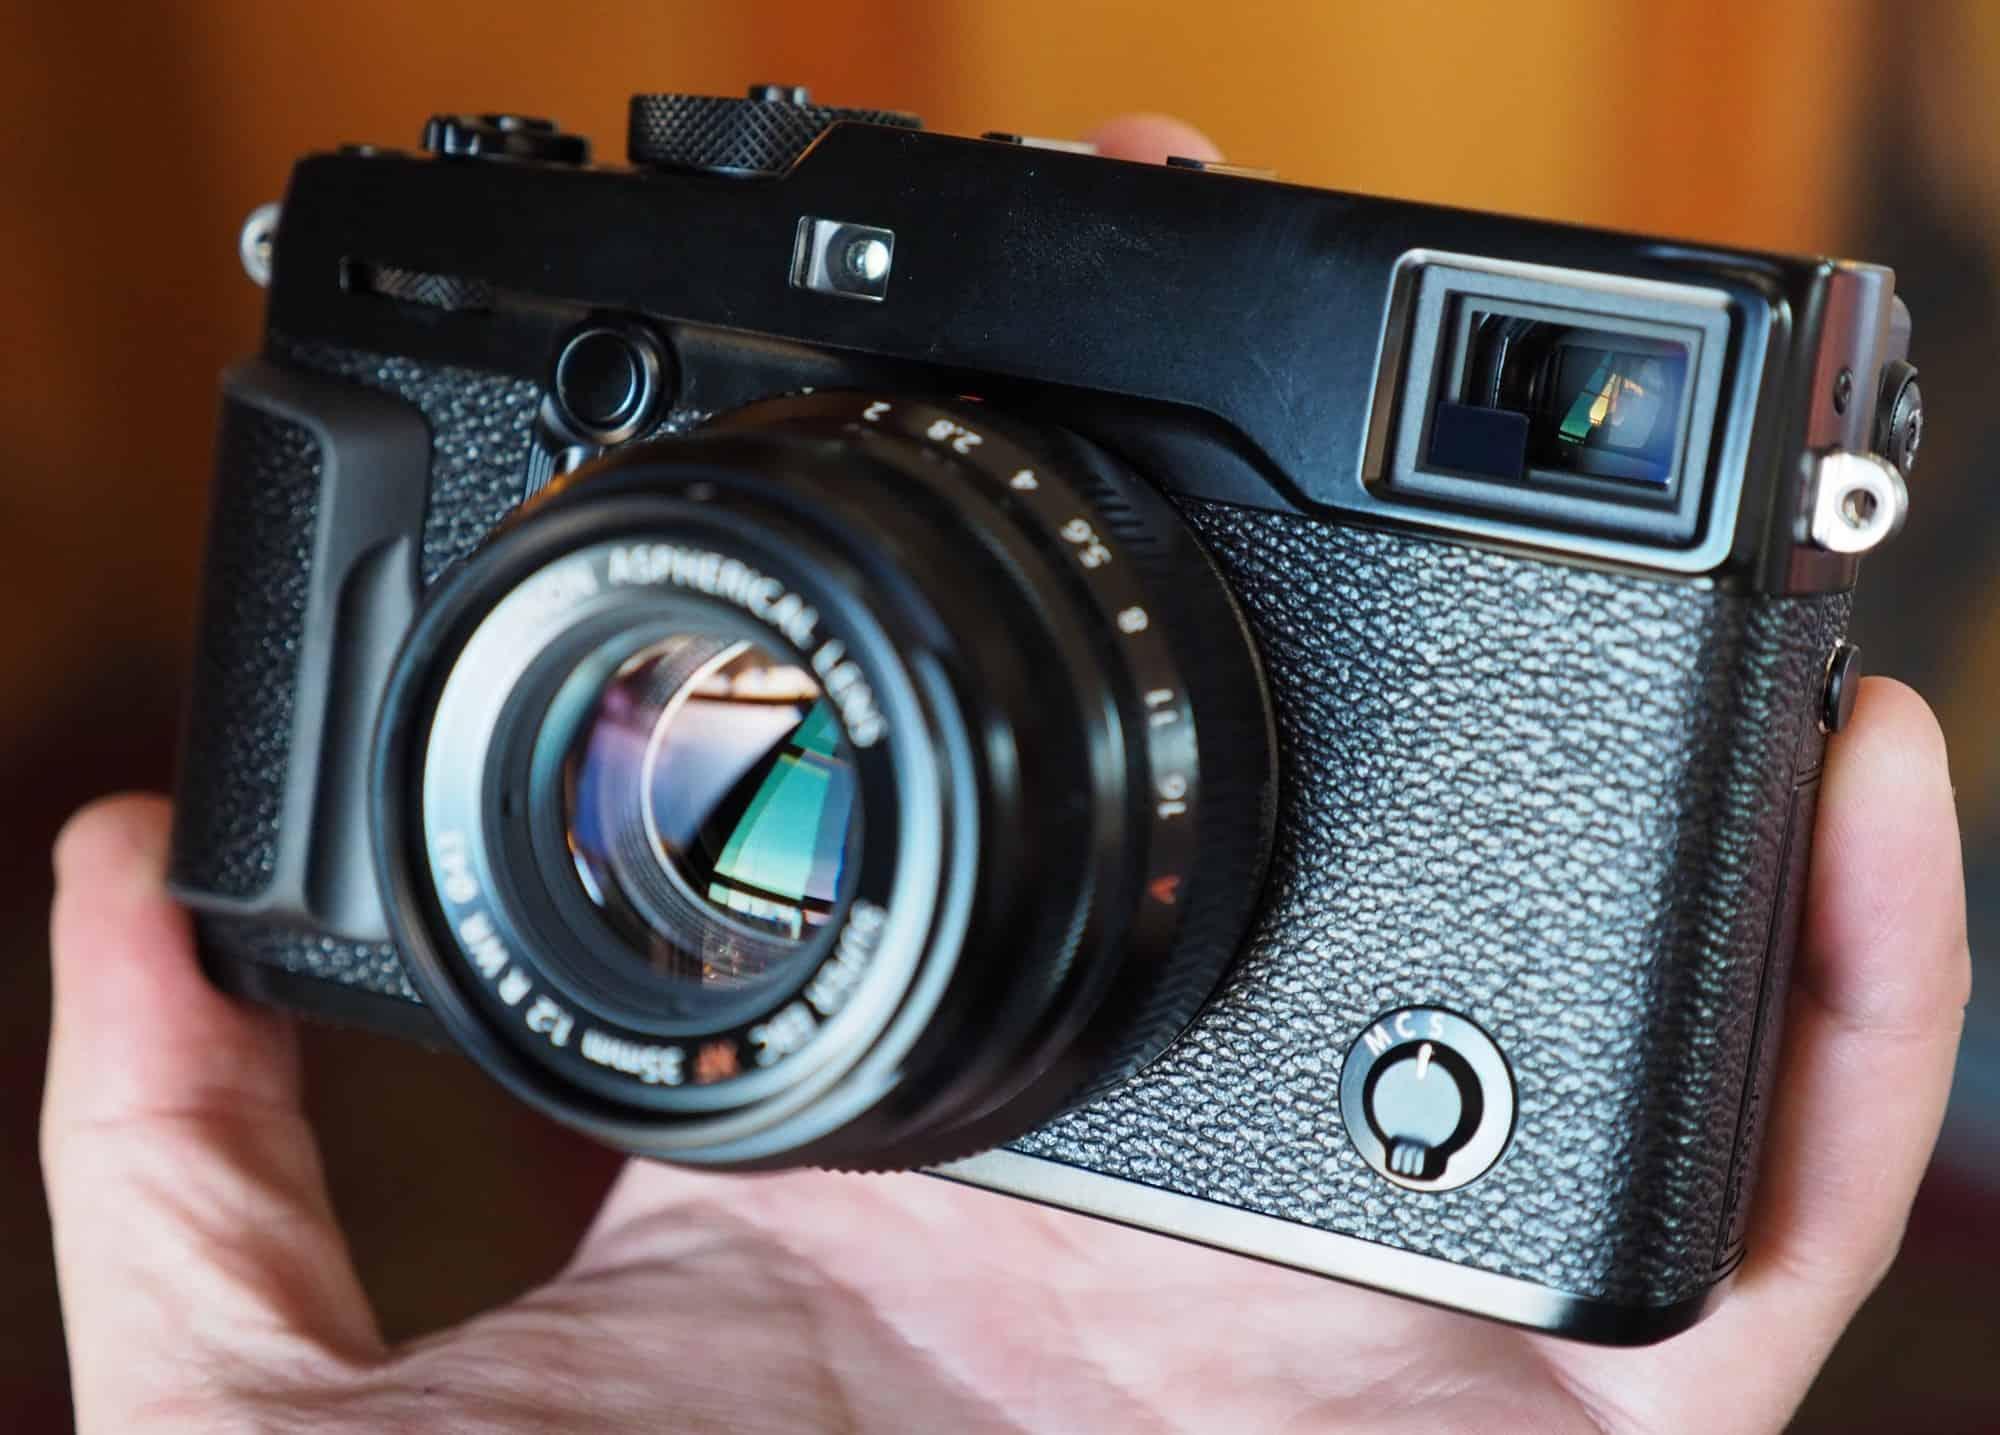 fujifilm x-pro 2 amateur camera